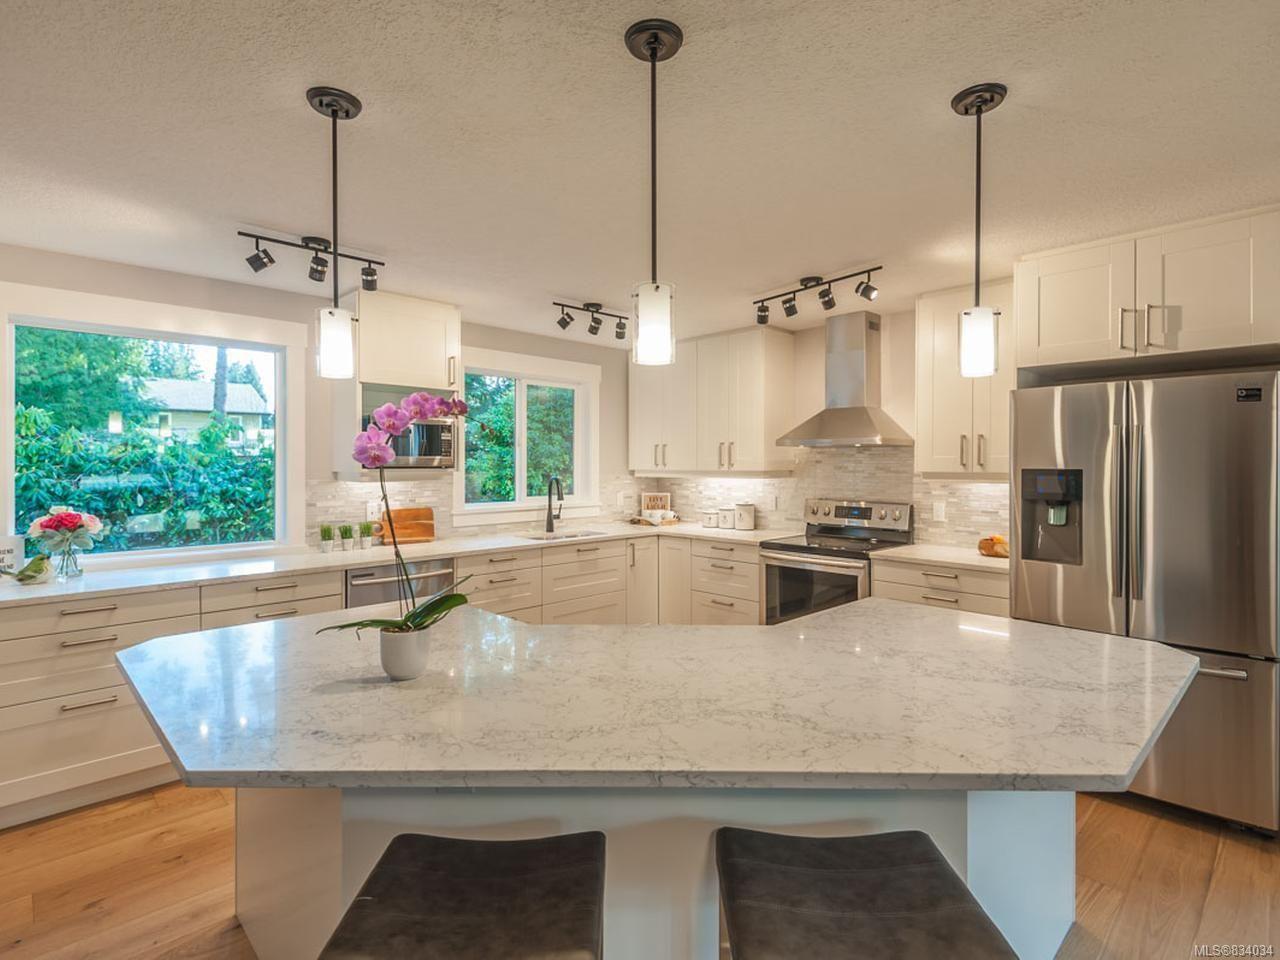 Main Photo: 527 Cleek Close in QUALICUM BEACH: PQ Qualicum Beach House for sale (Parksville/Qualicum)  : MLS®# 834034